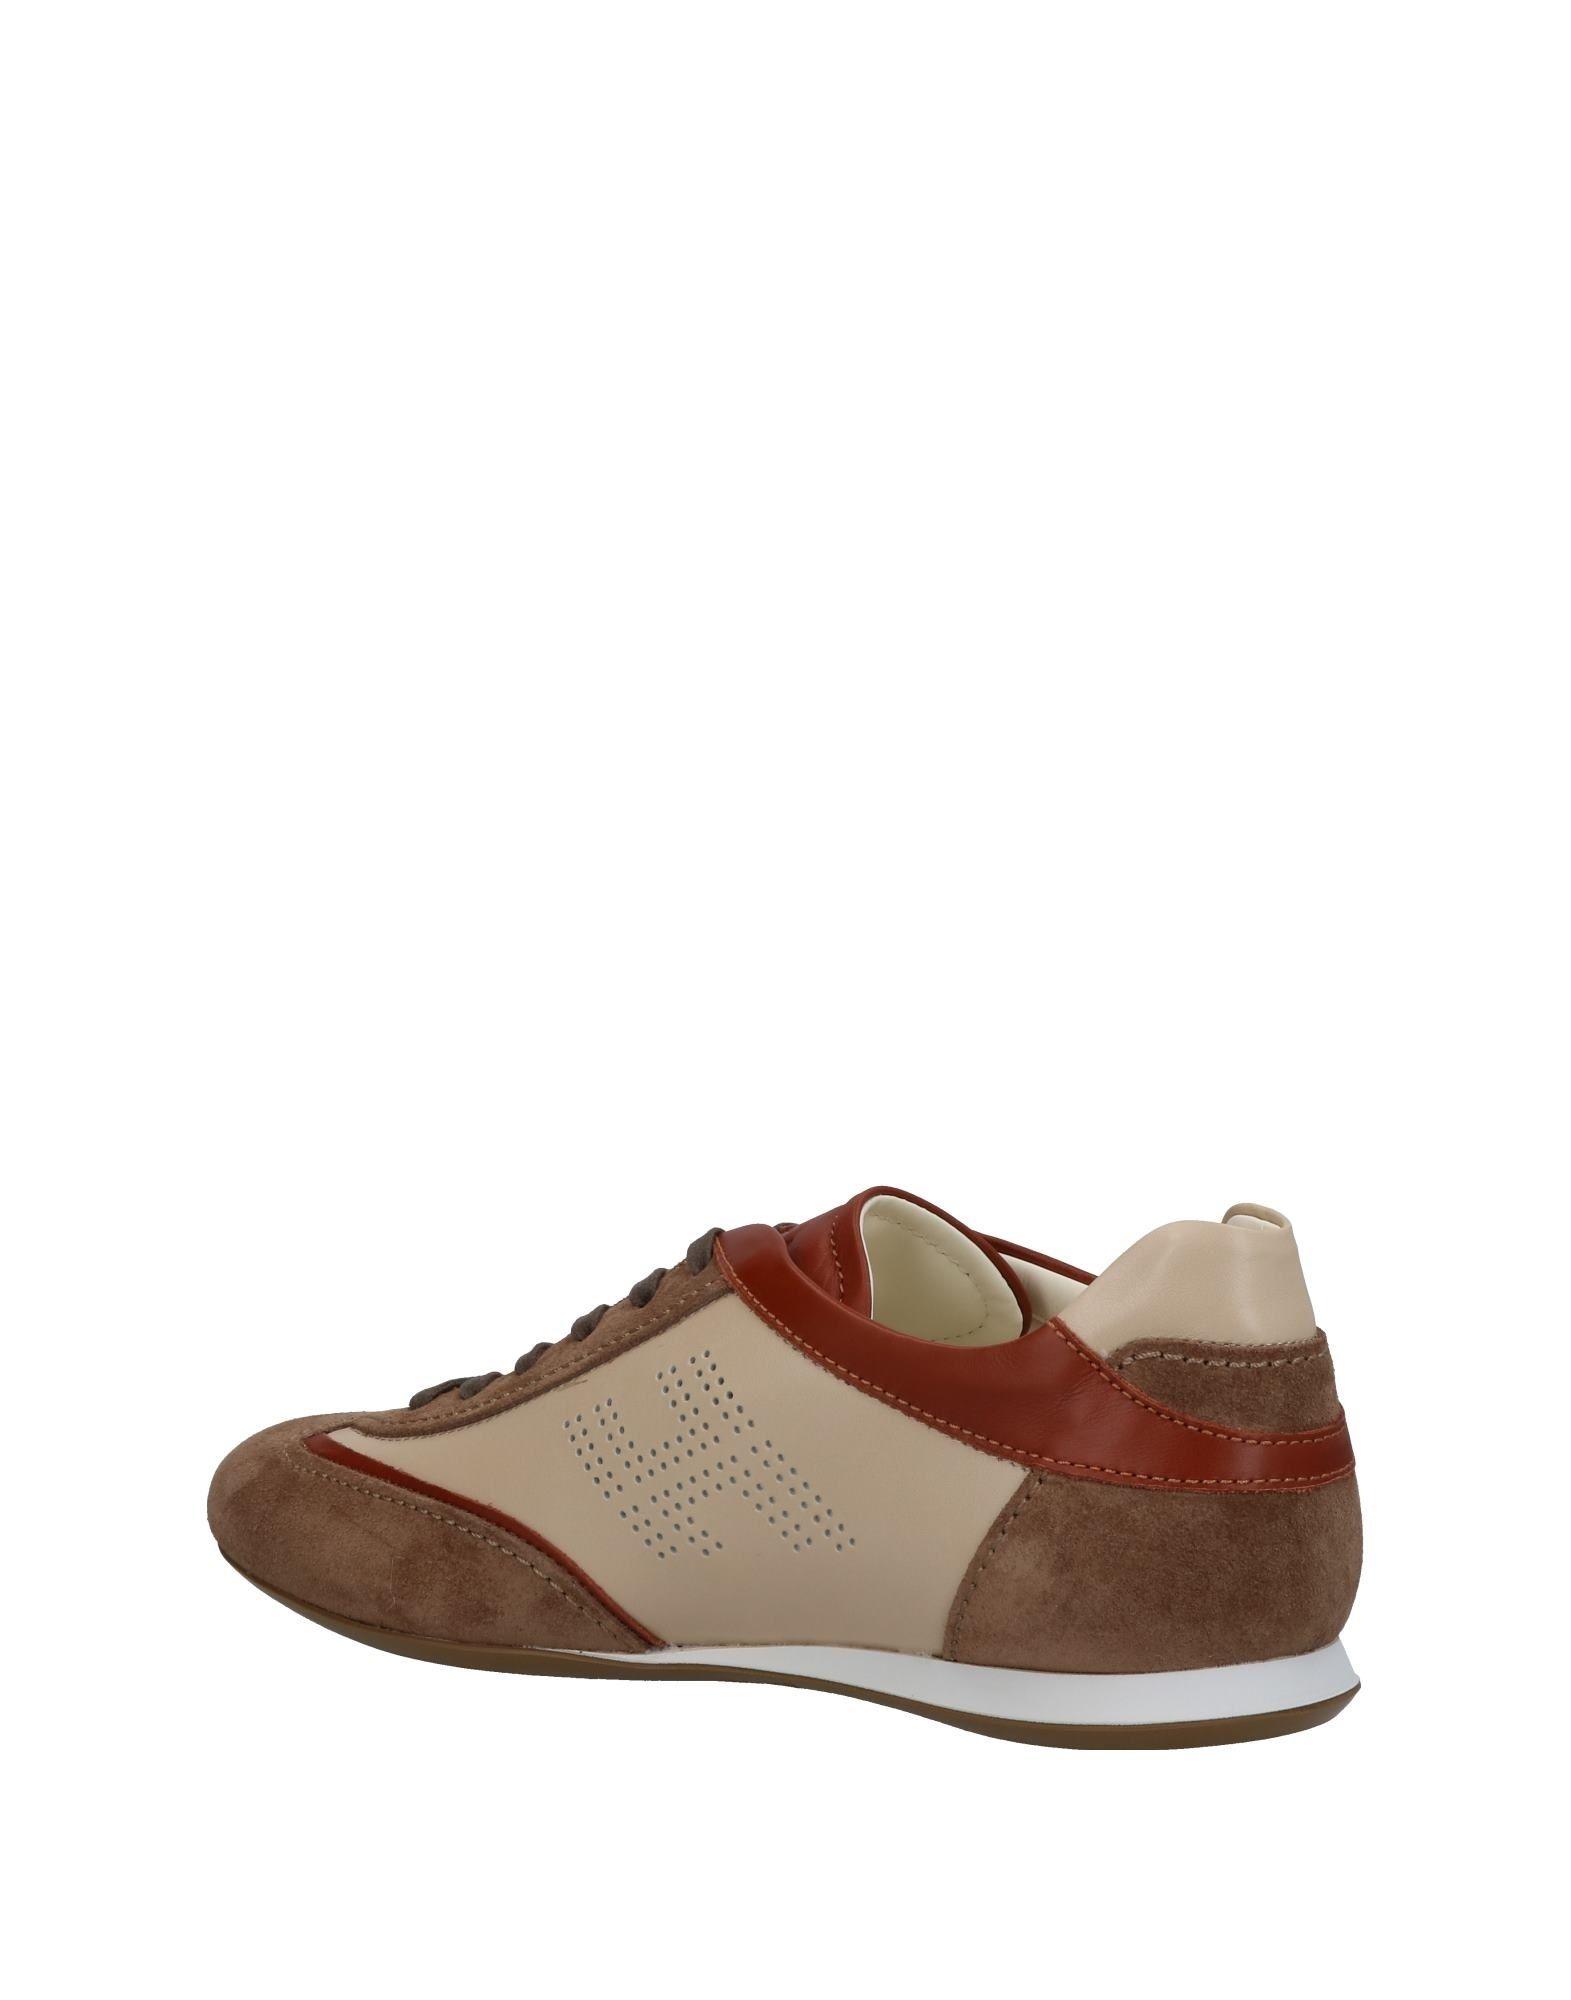 Hogan Sneakers - Men Hogan Sneakers online - on  United Kingdom - online 11396874CL c3e9a3